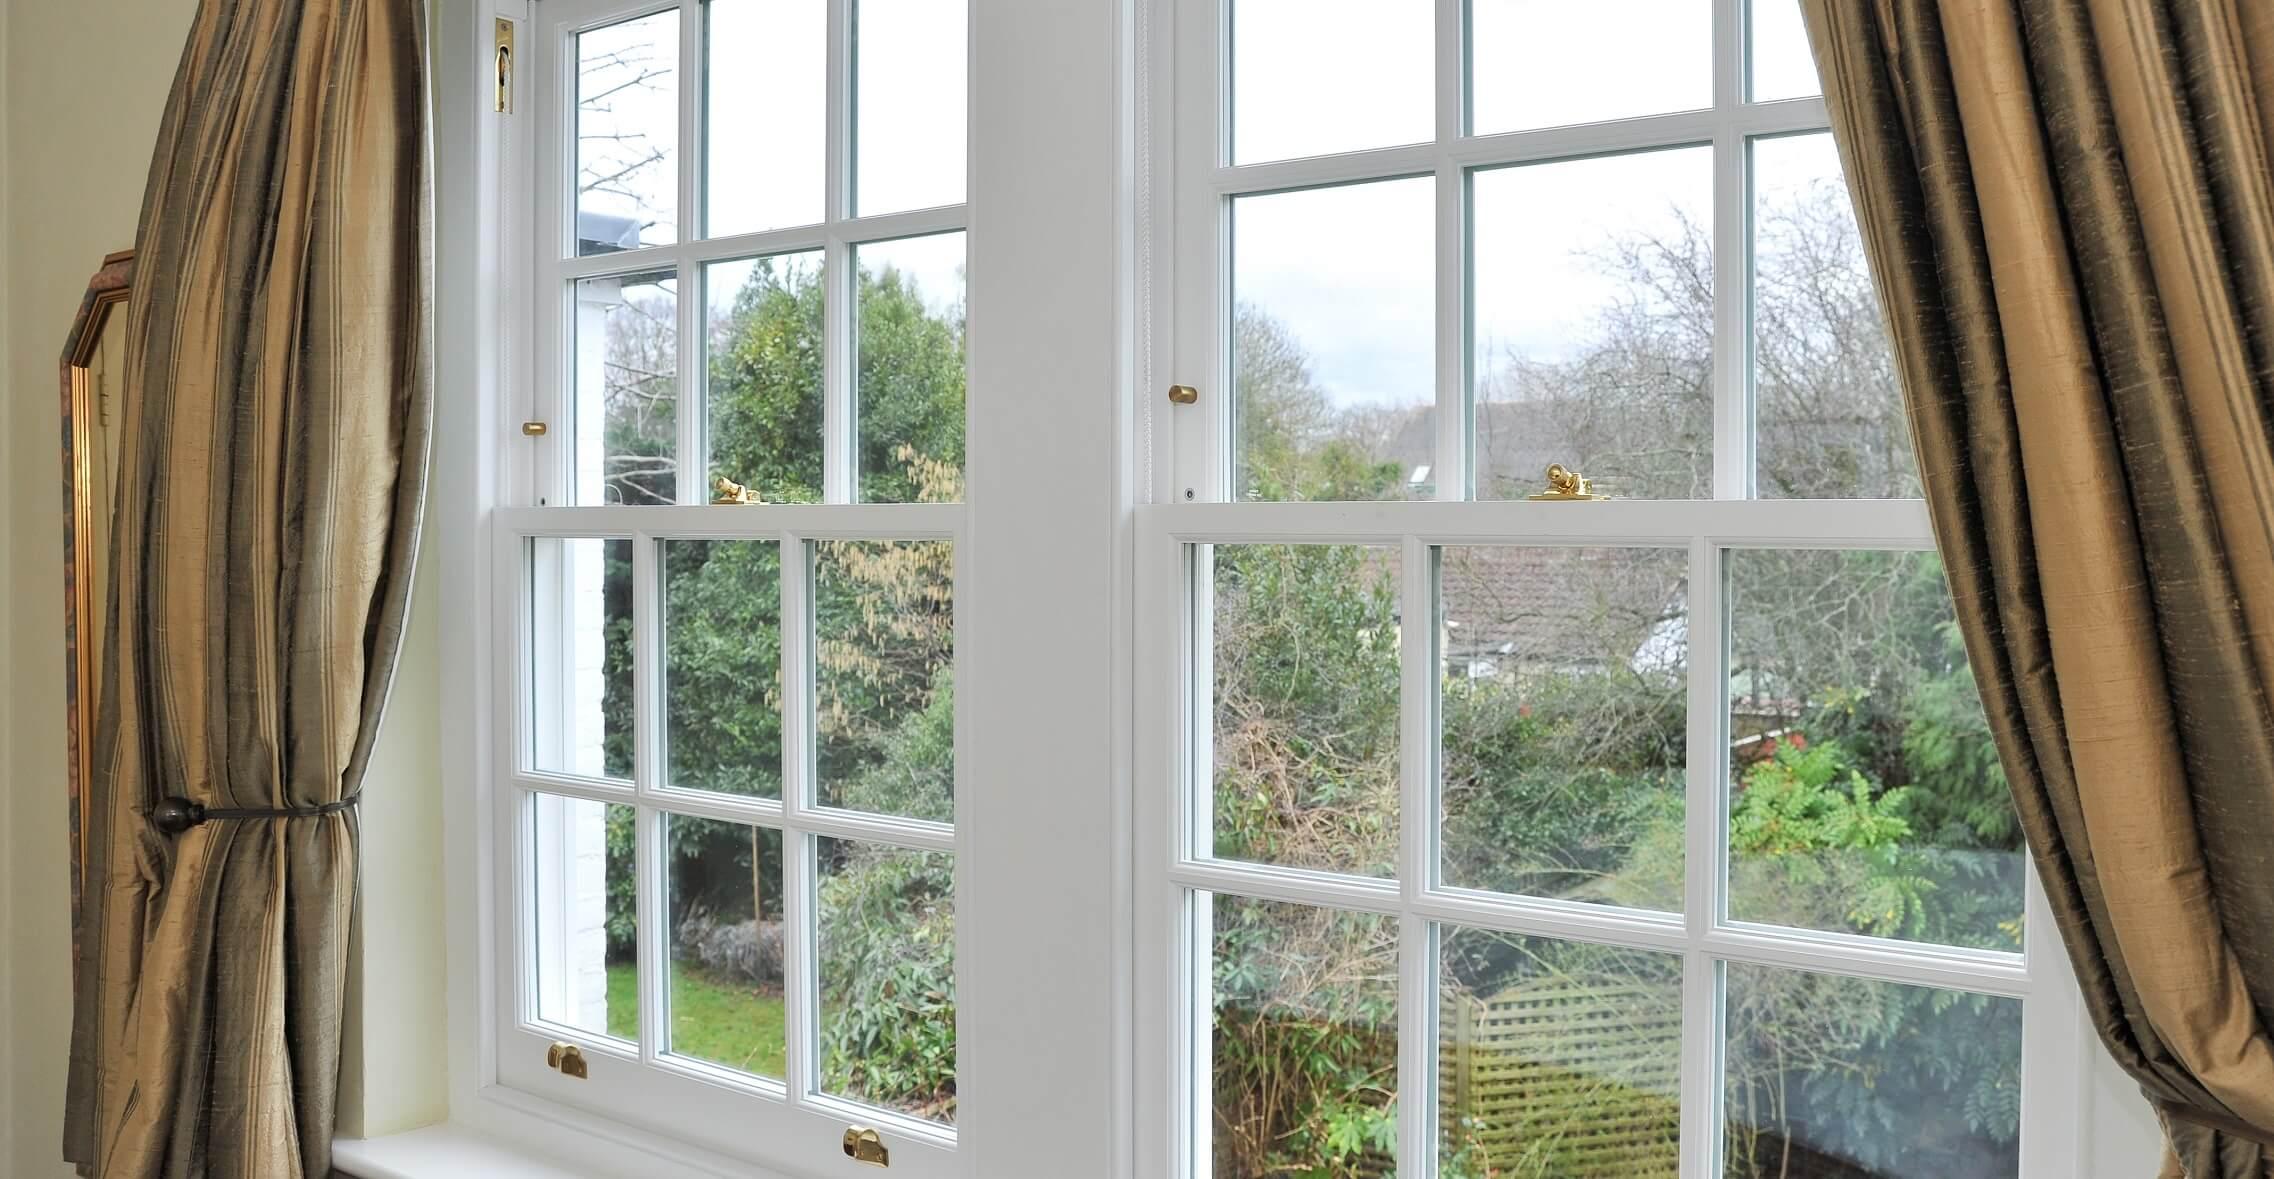 6 over 6 sash windows